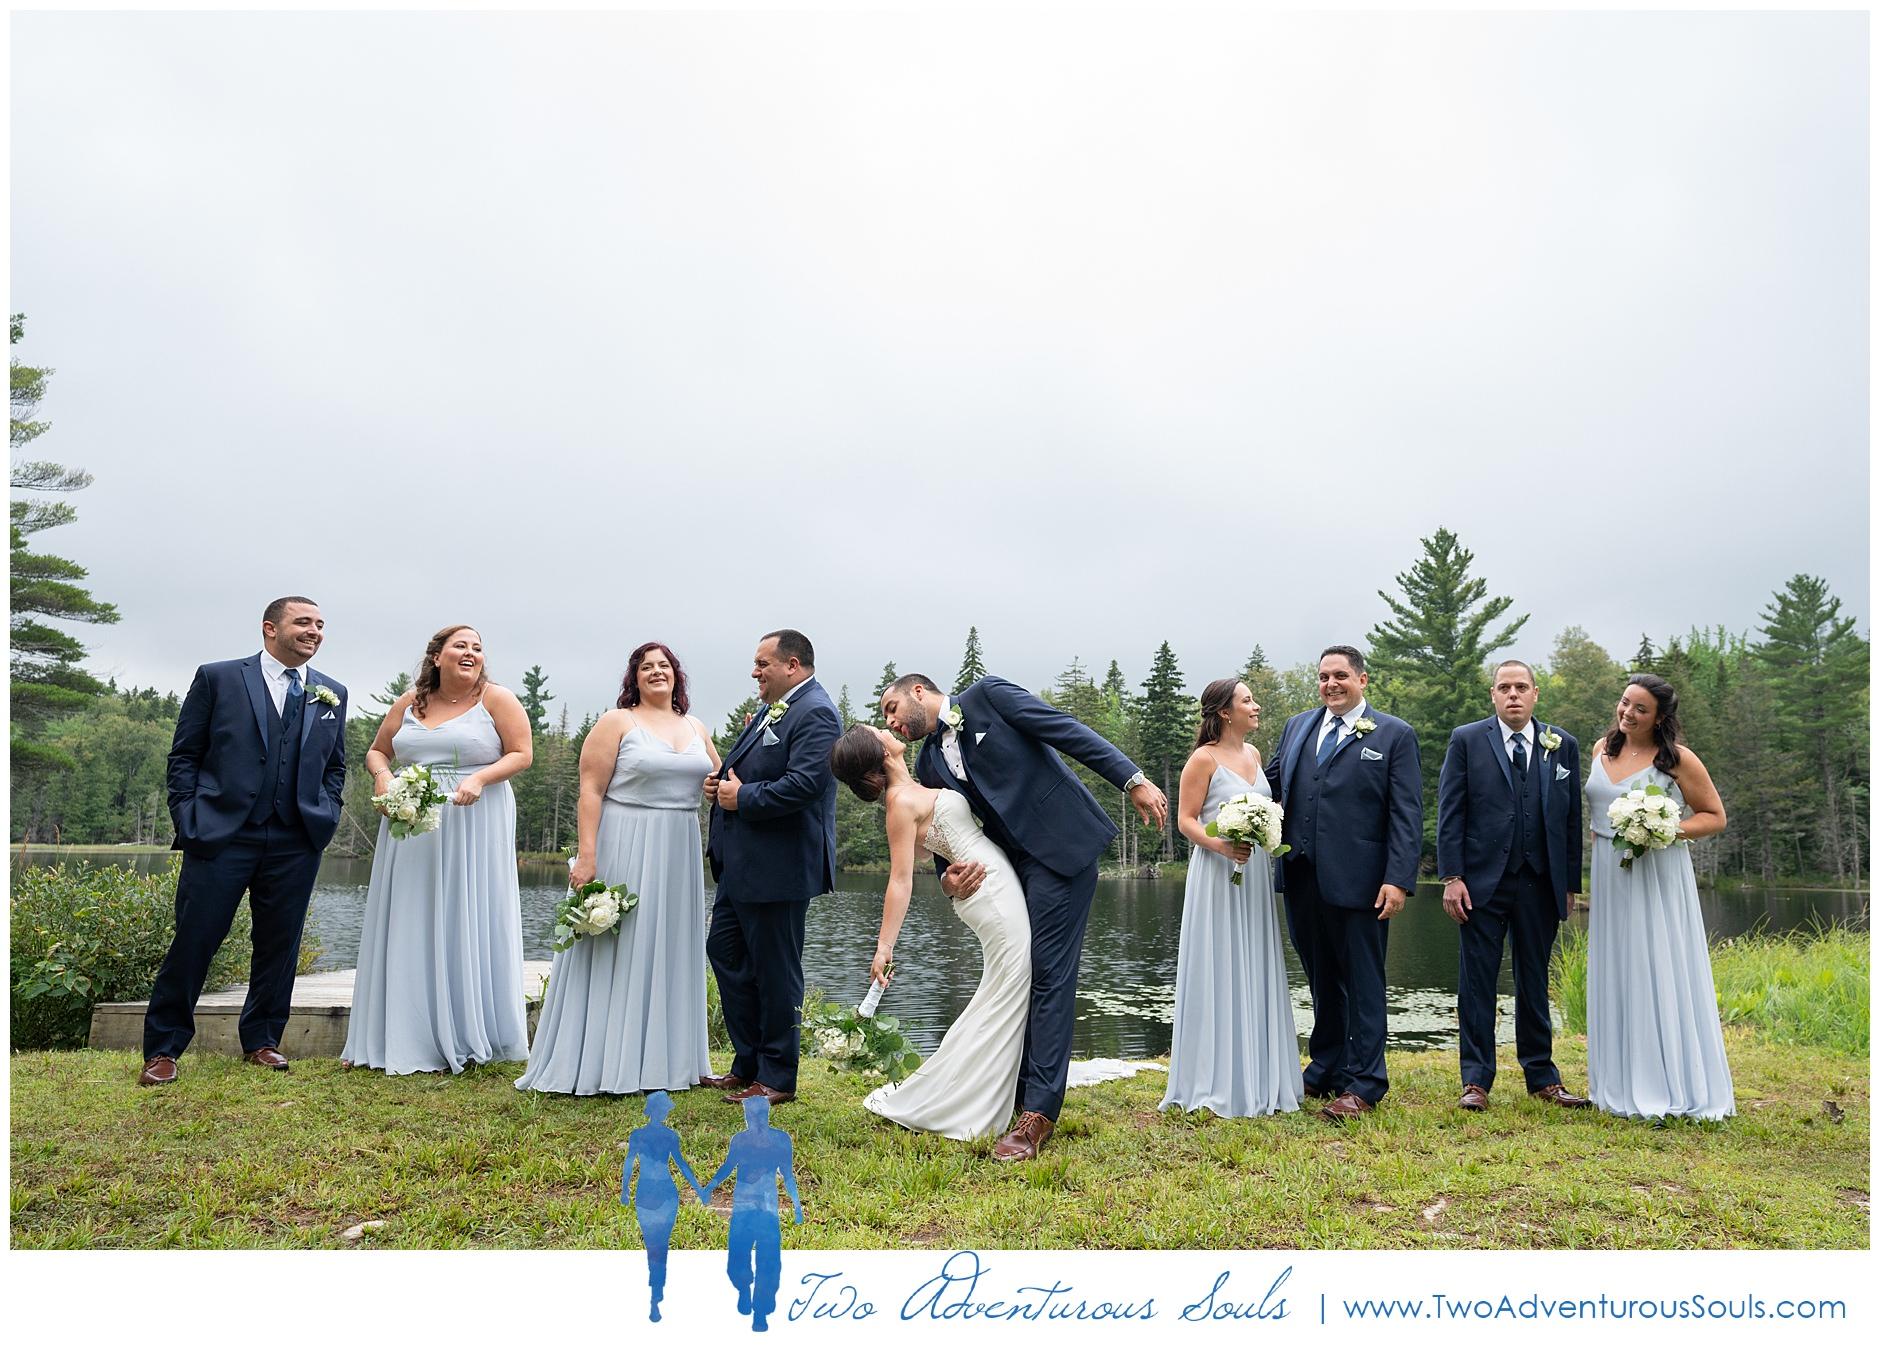 Sugarloaf Outdoor Center Wedding Photographers, Destination Wedding Photographers, Two Adventurous Souls-081719_0046.jpg